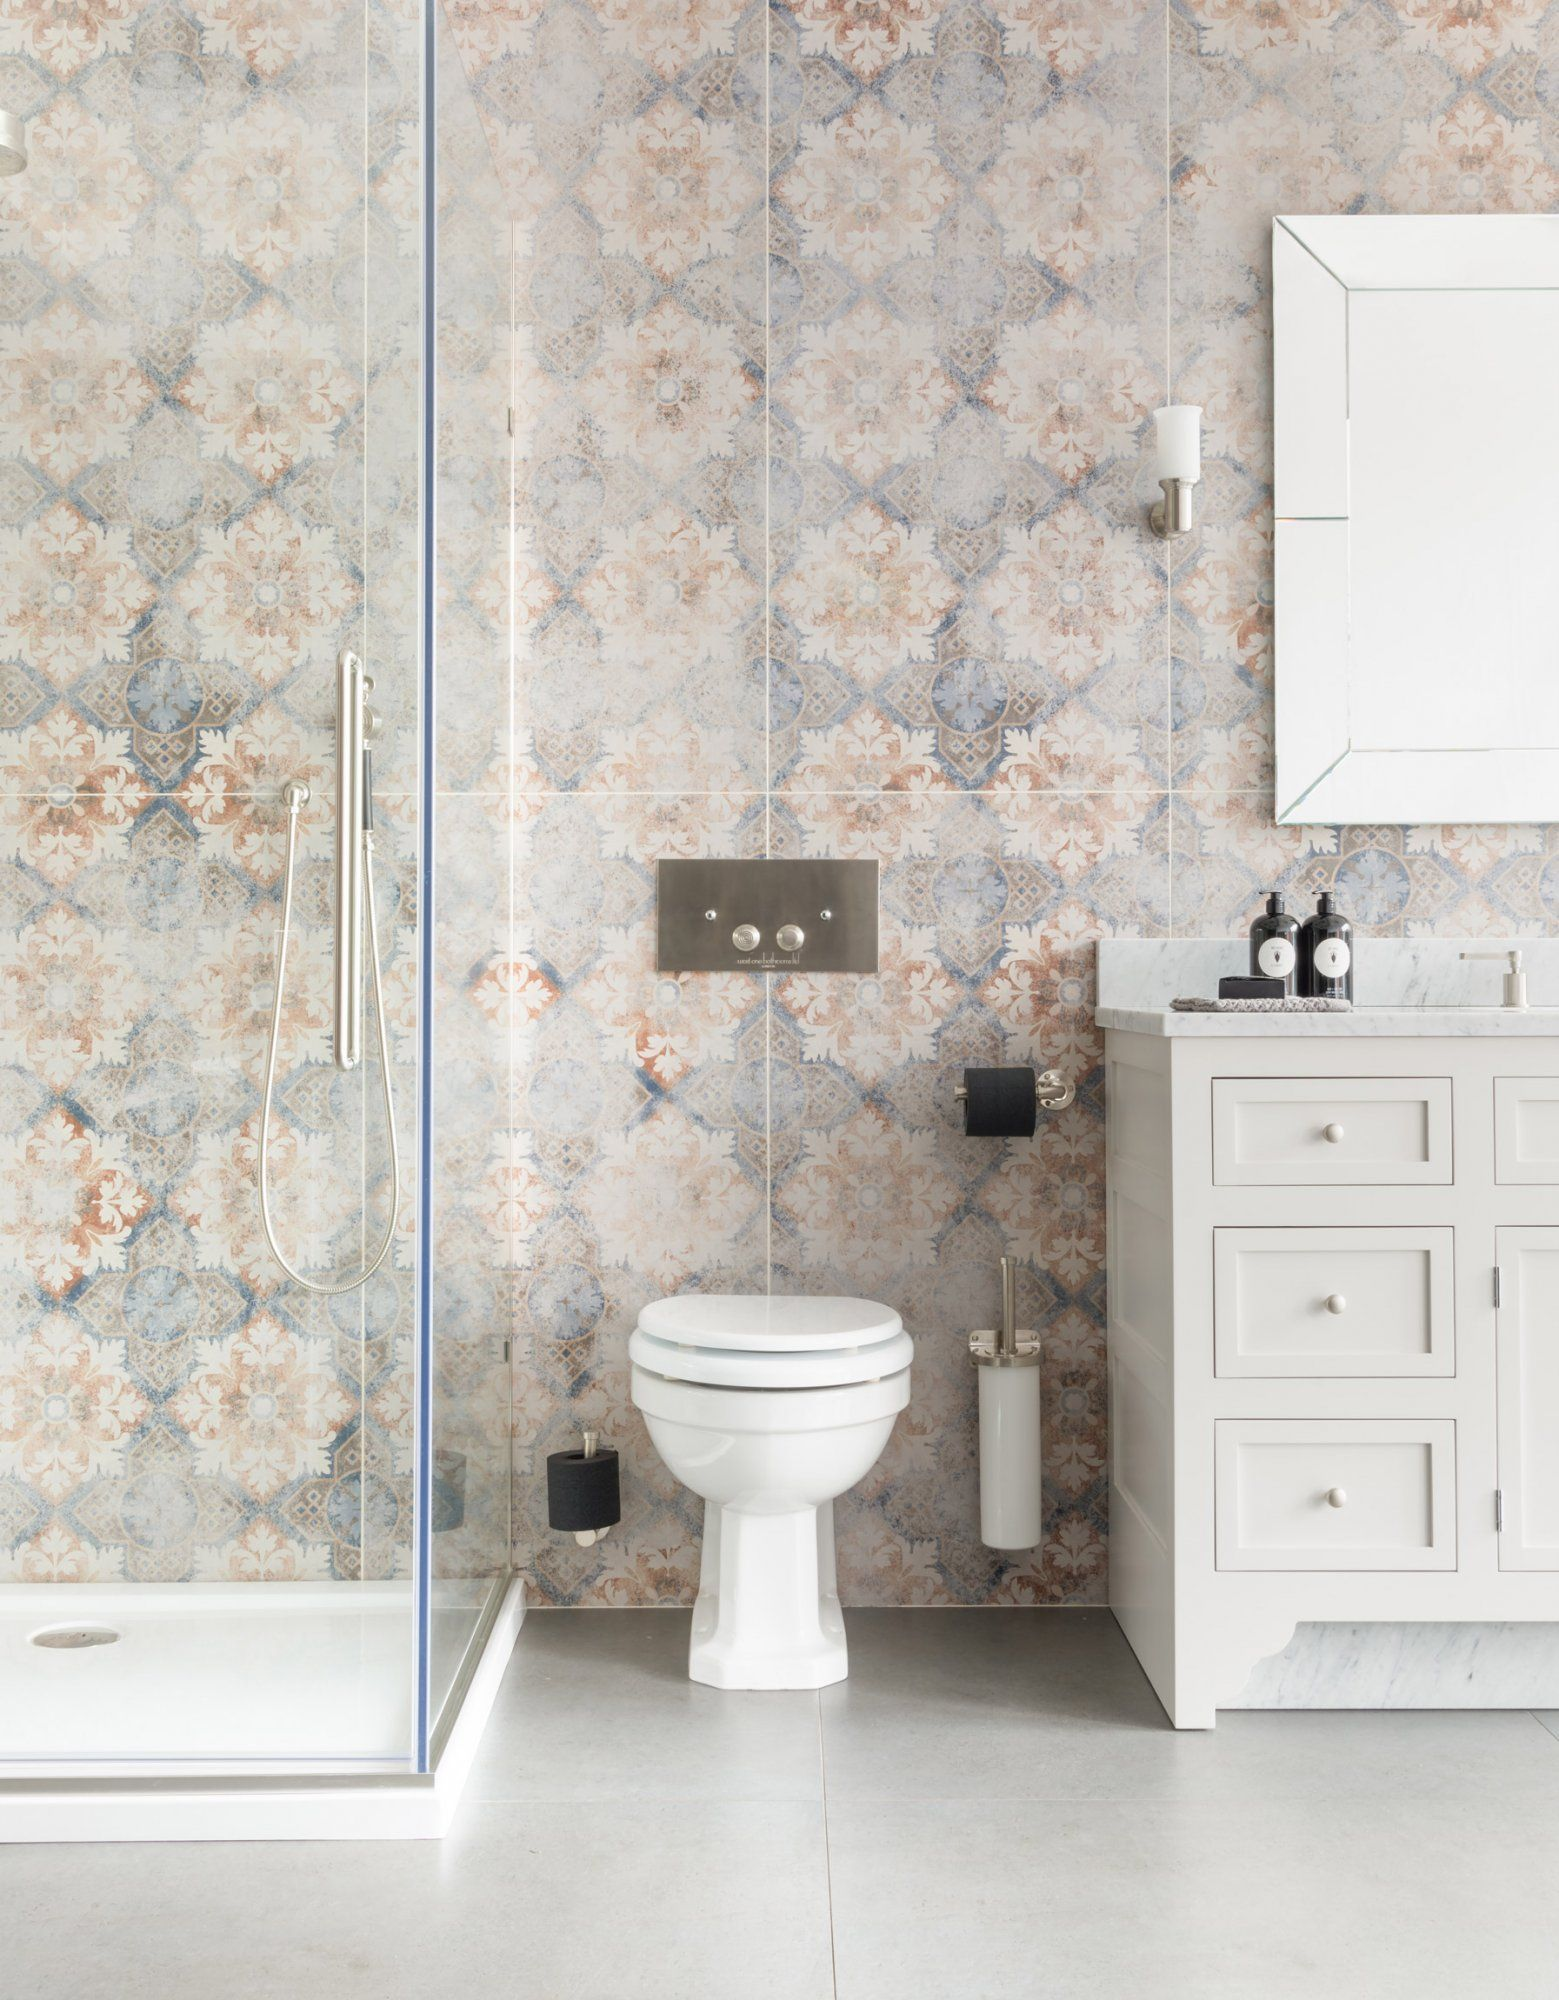 Warehouse Bathroom design luxury, Bathroom designs india